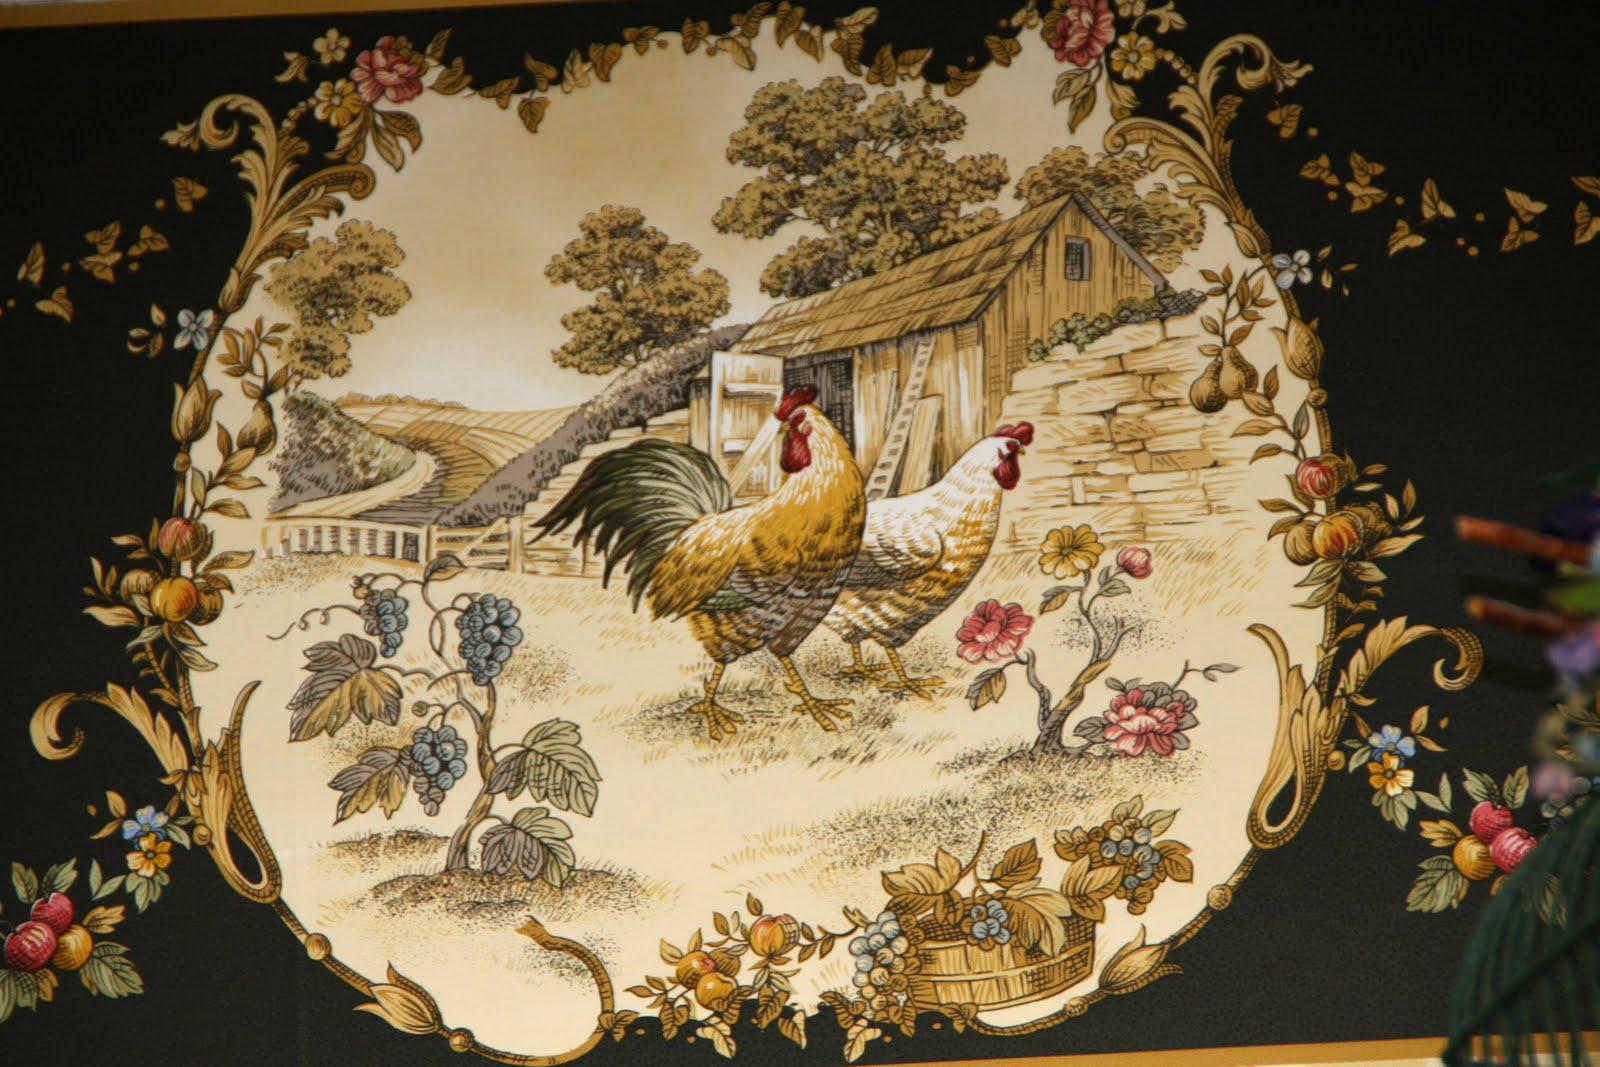 Chicken Wallpaper Border   Free Download Wallpaper   DaWallpaperz